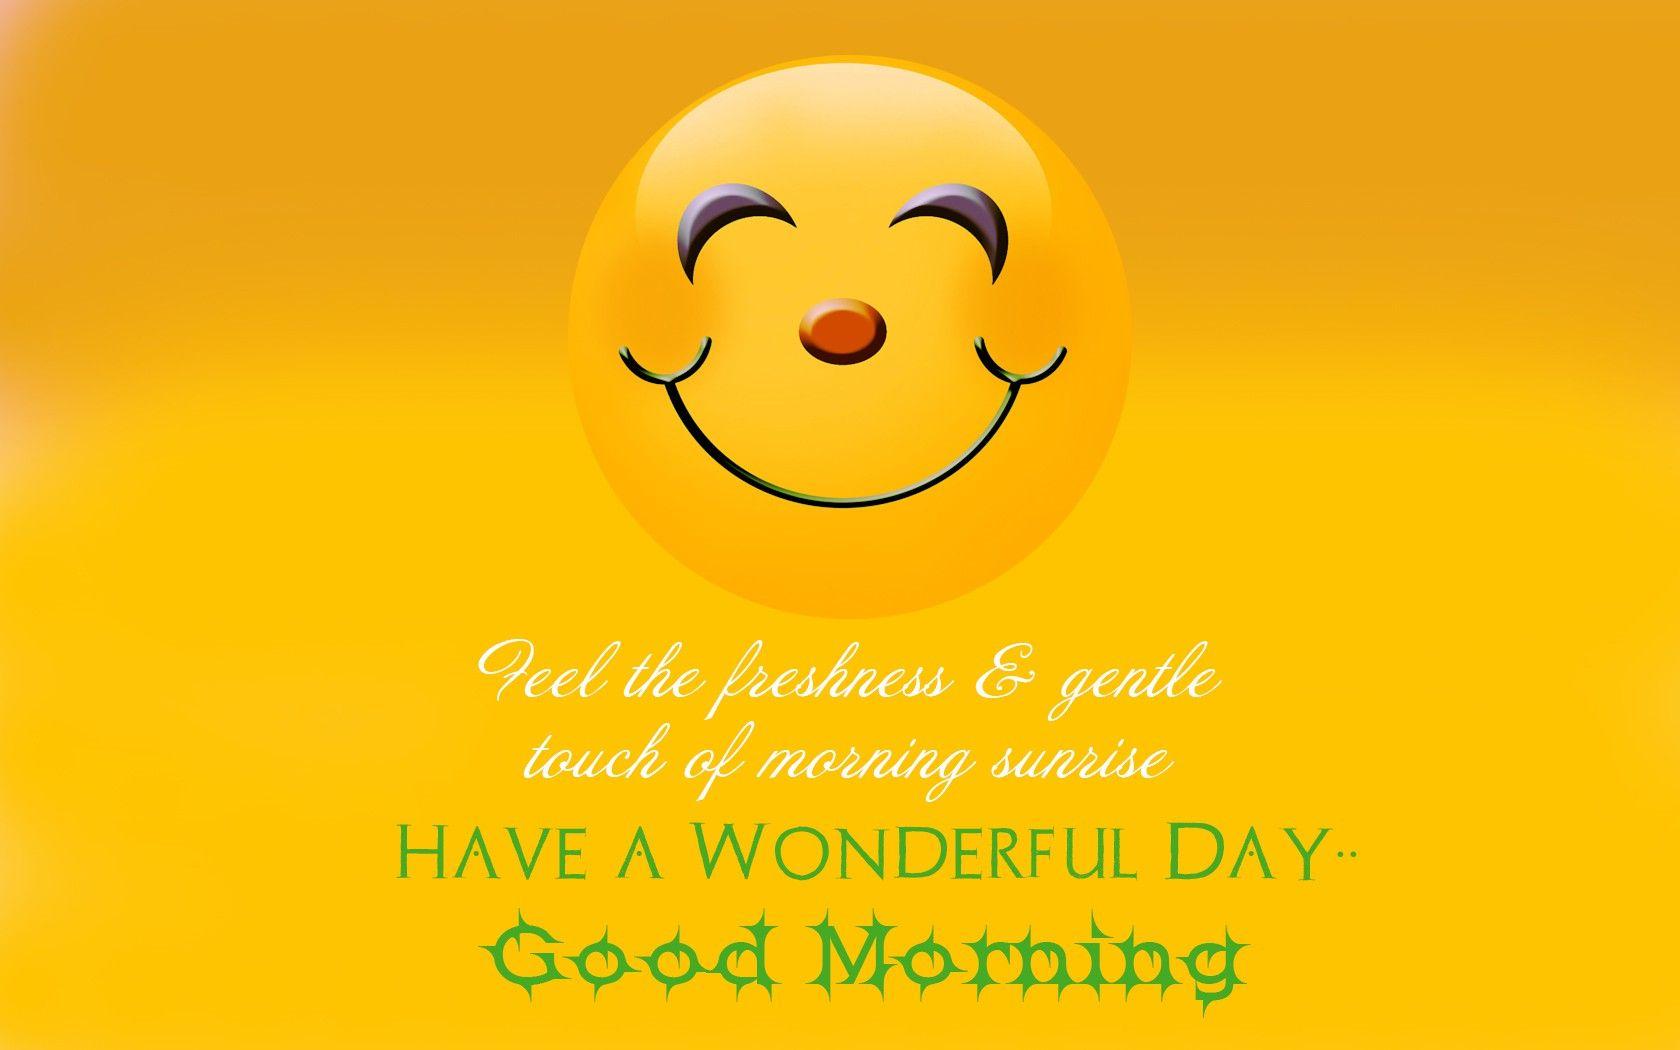 Good Morning Pictures Good Morning Pinterest Good Morning